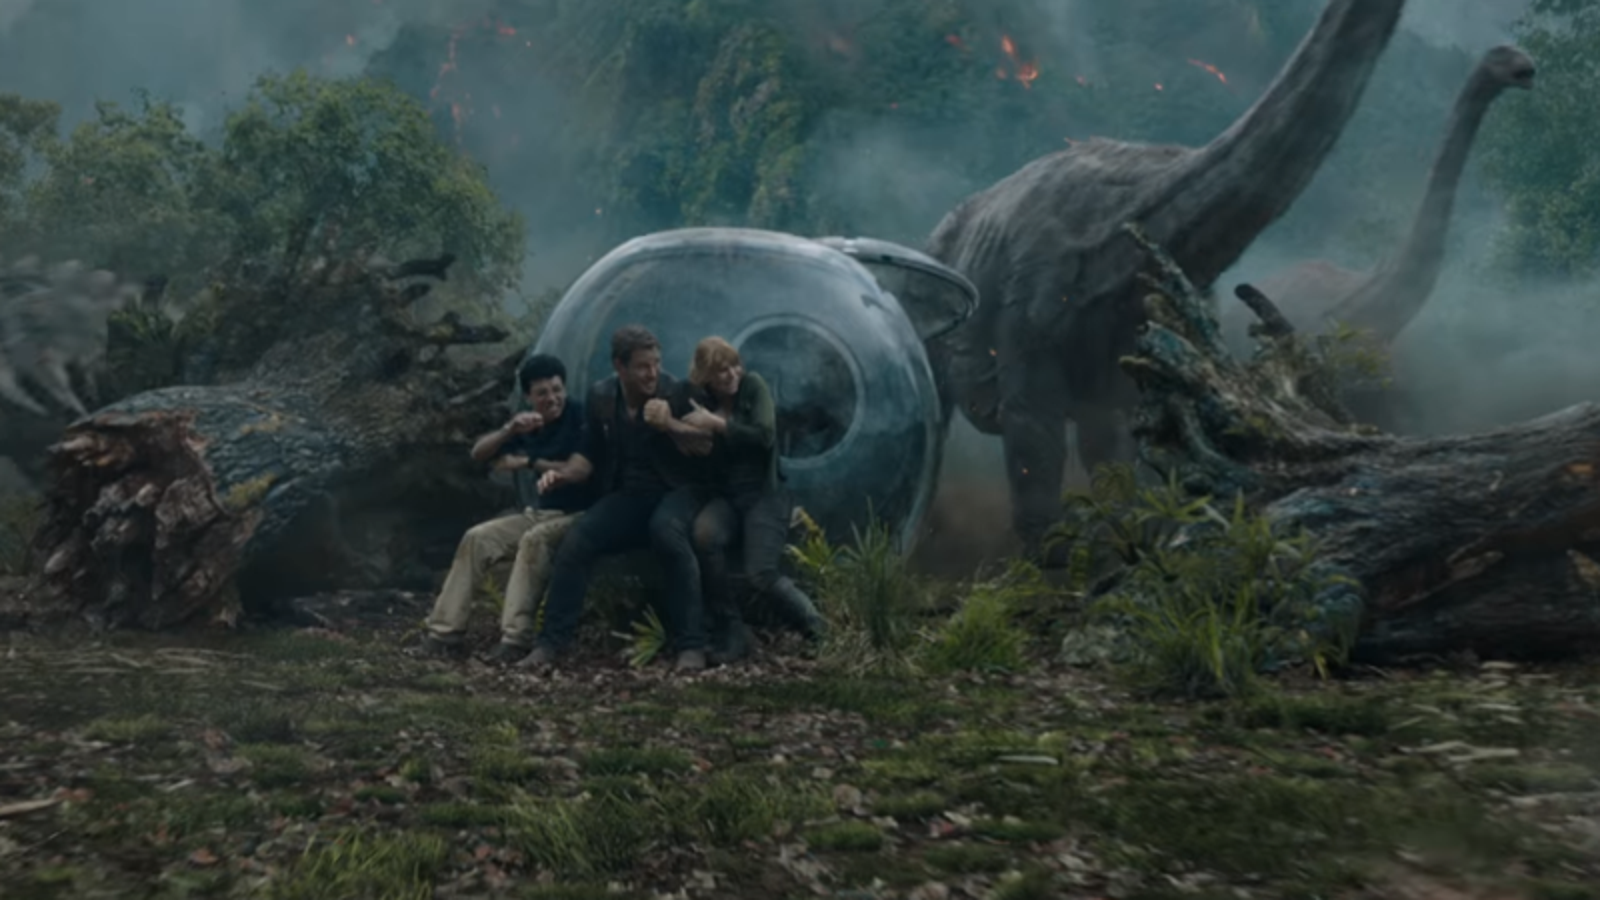 Jurassic world fallen kingdom is all about saving the dinosaurs and a big ass volcano - Film de dinosaure jurassic park ...